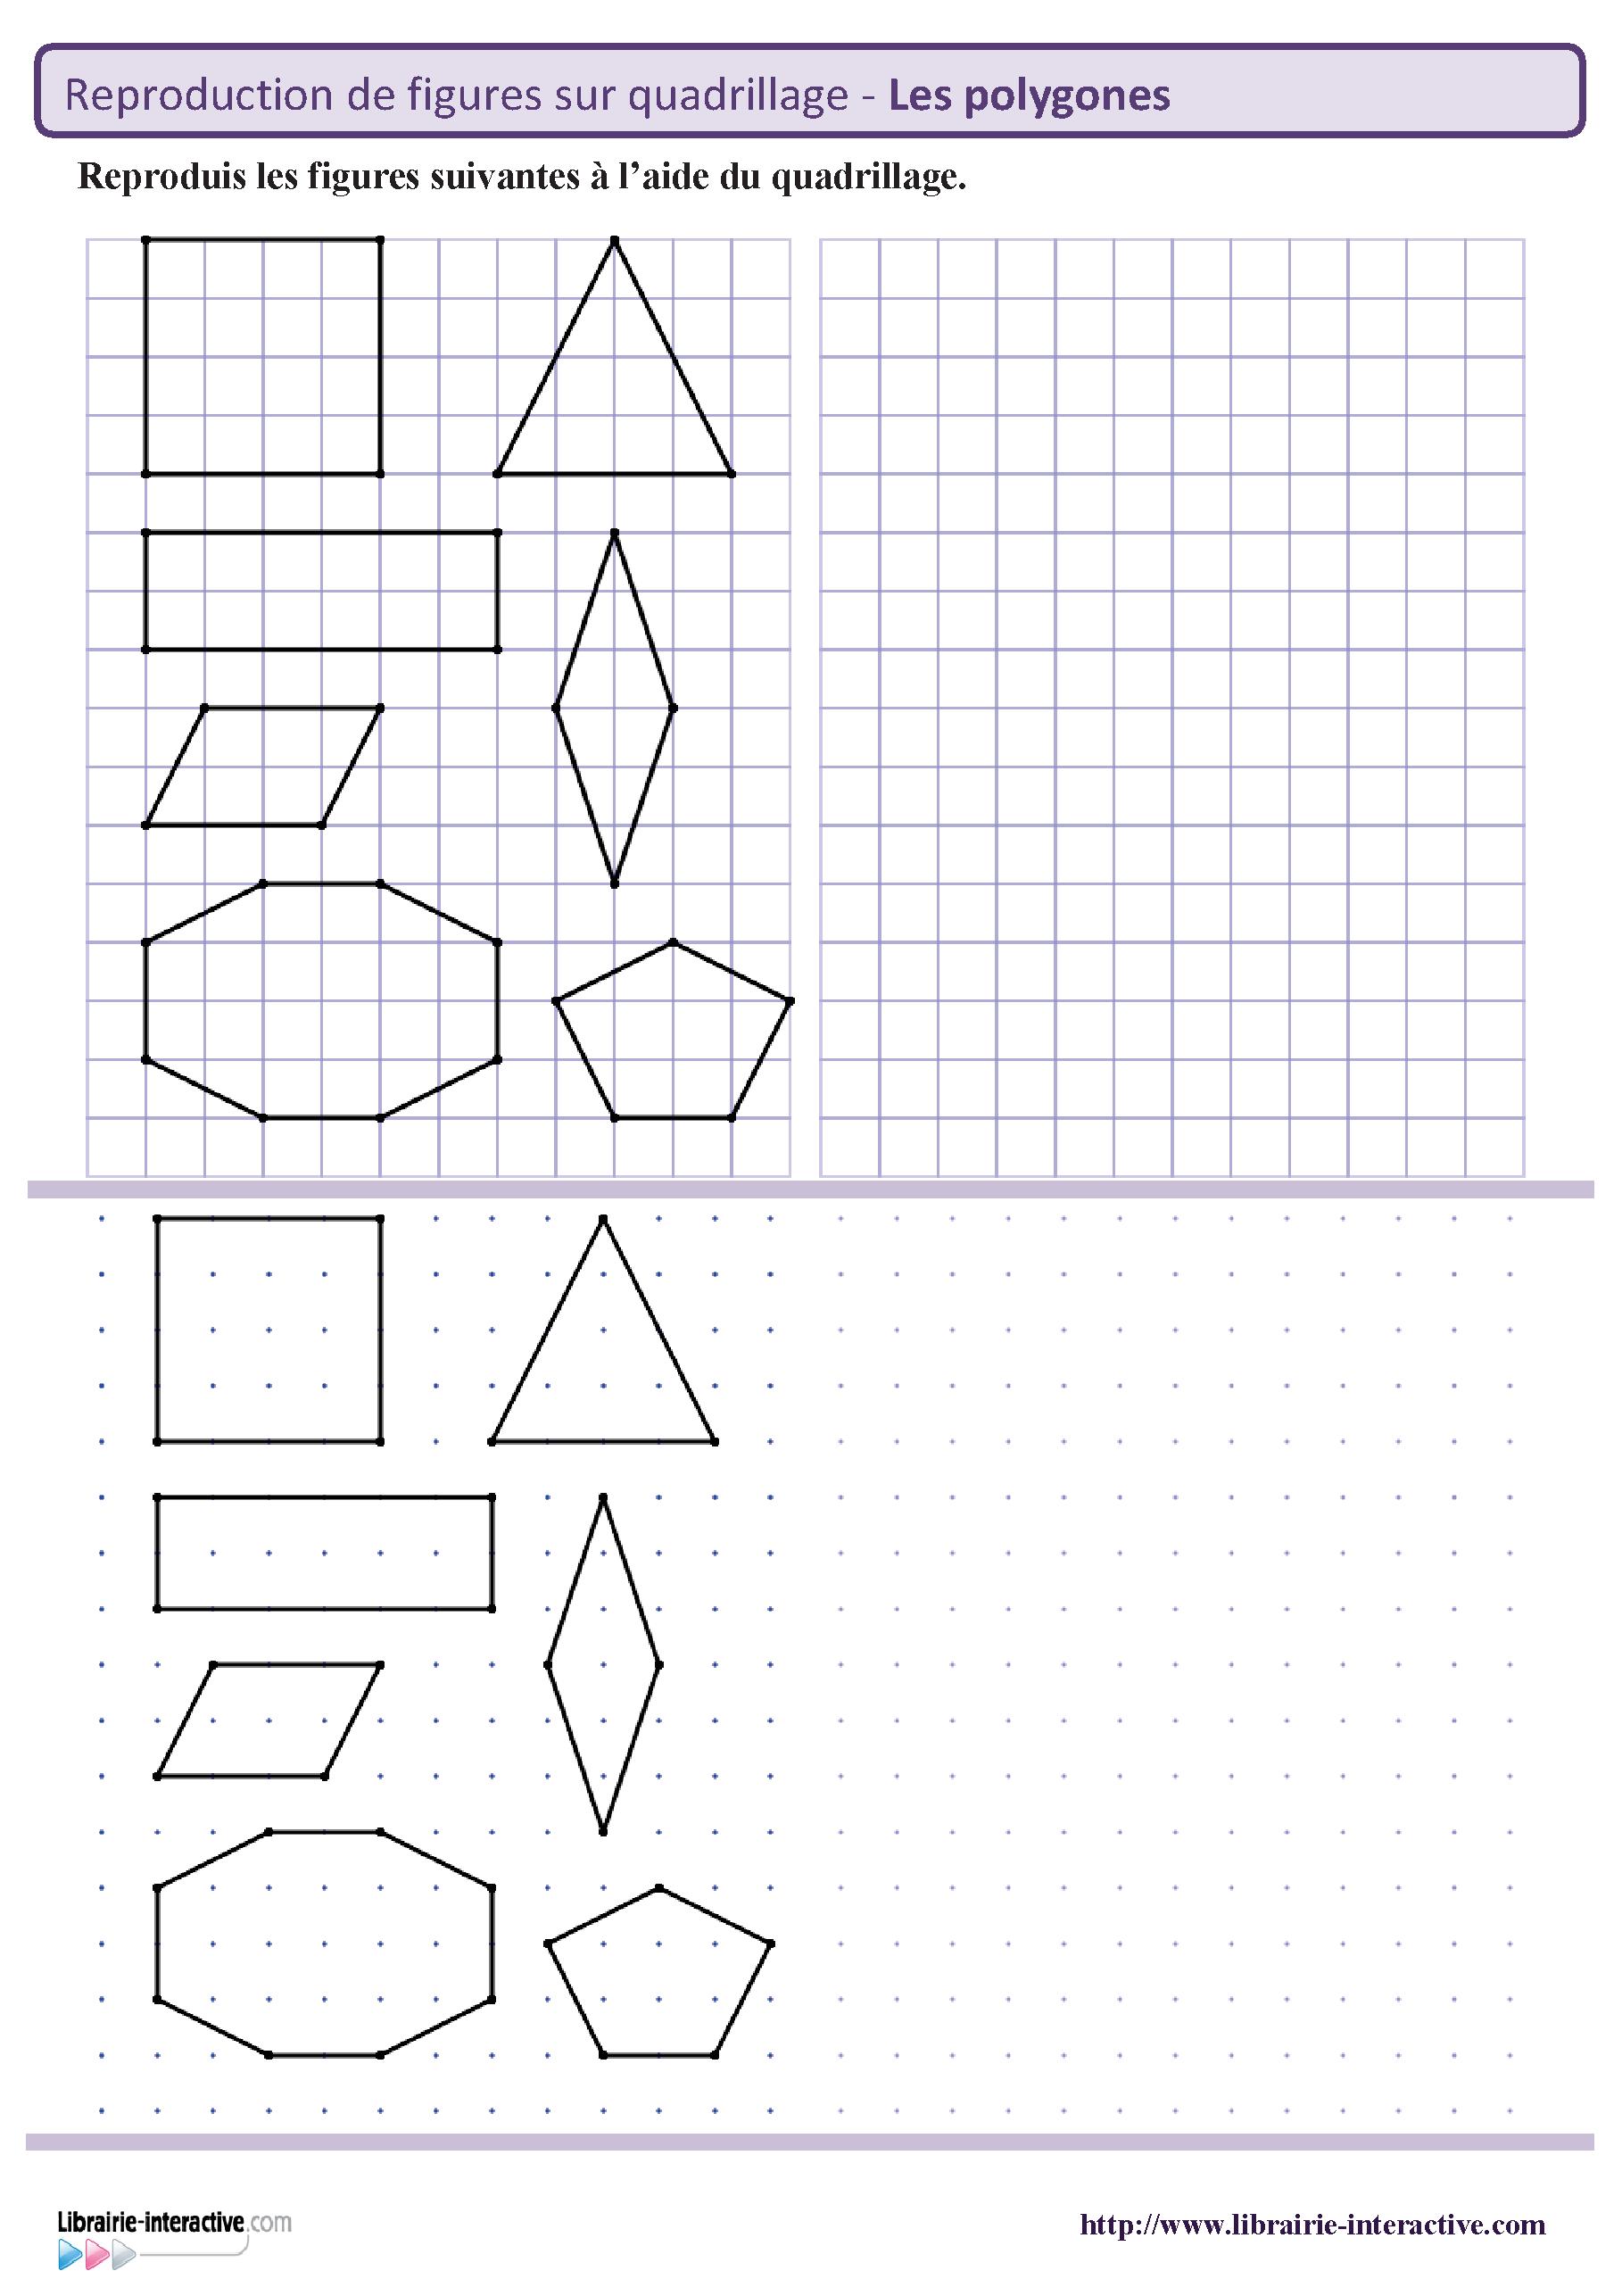 Polygones Sur Quadrillage Geometrie Ce1 Quadrillage Geometrie Ce2